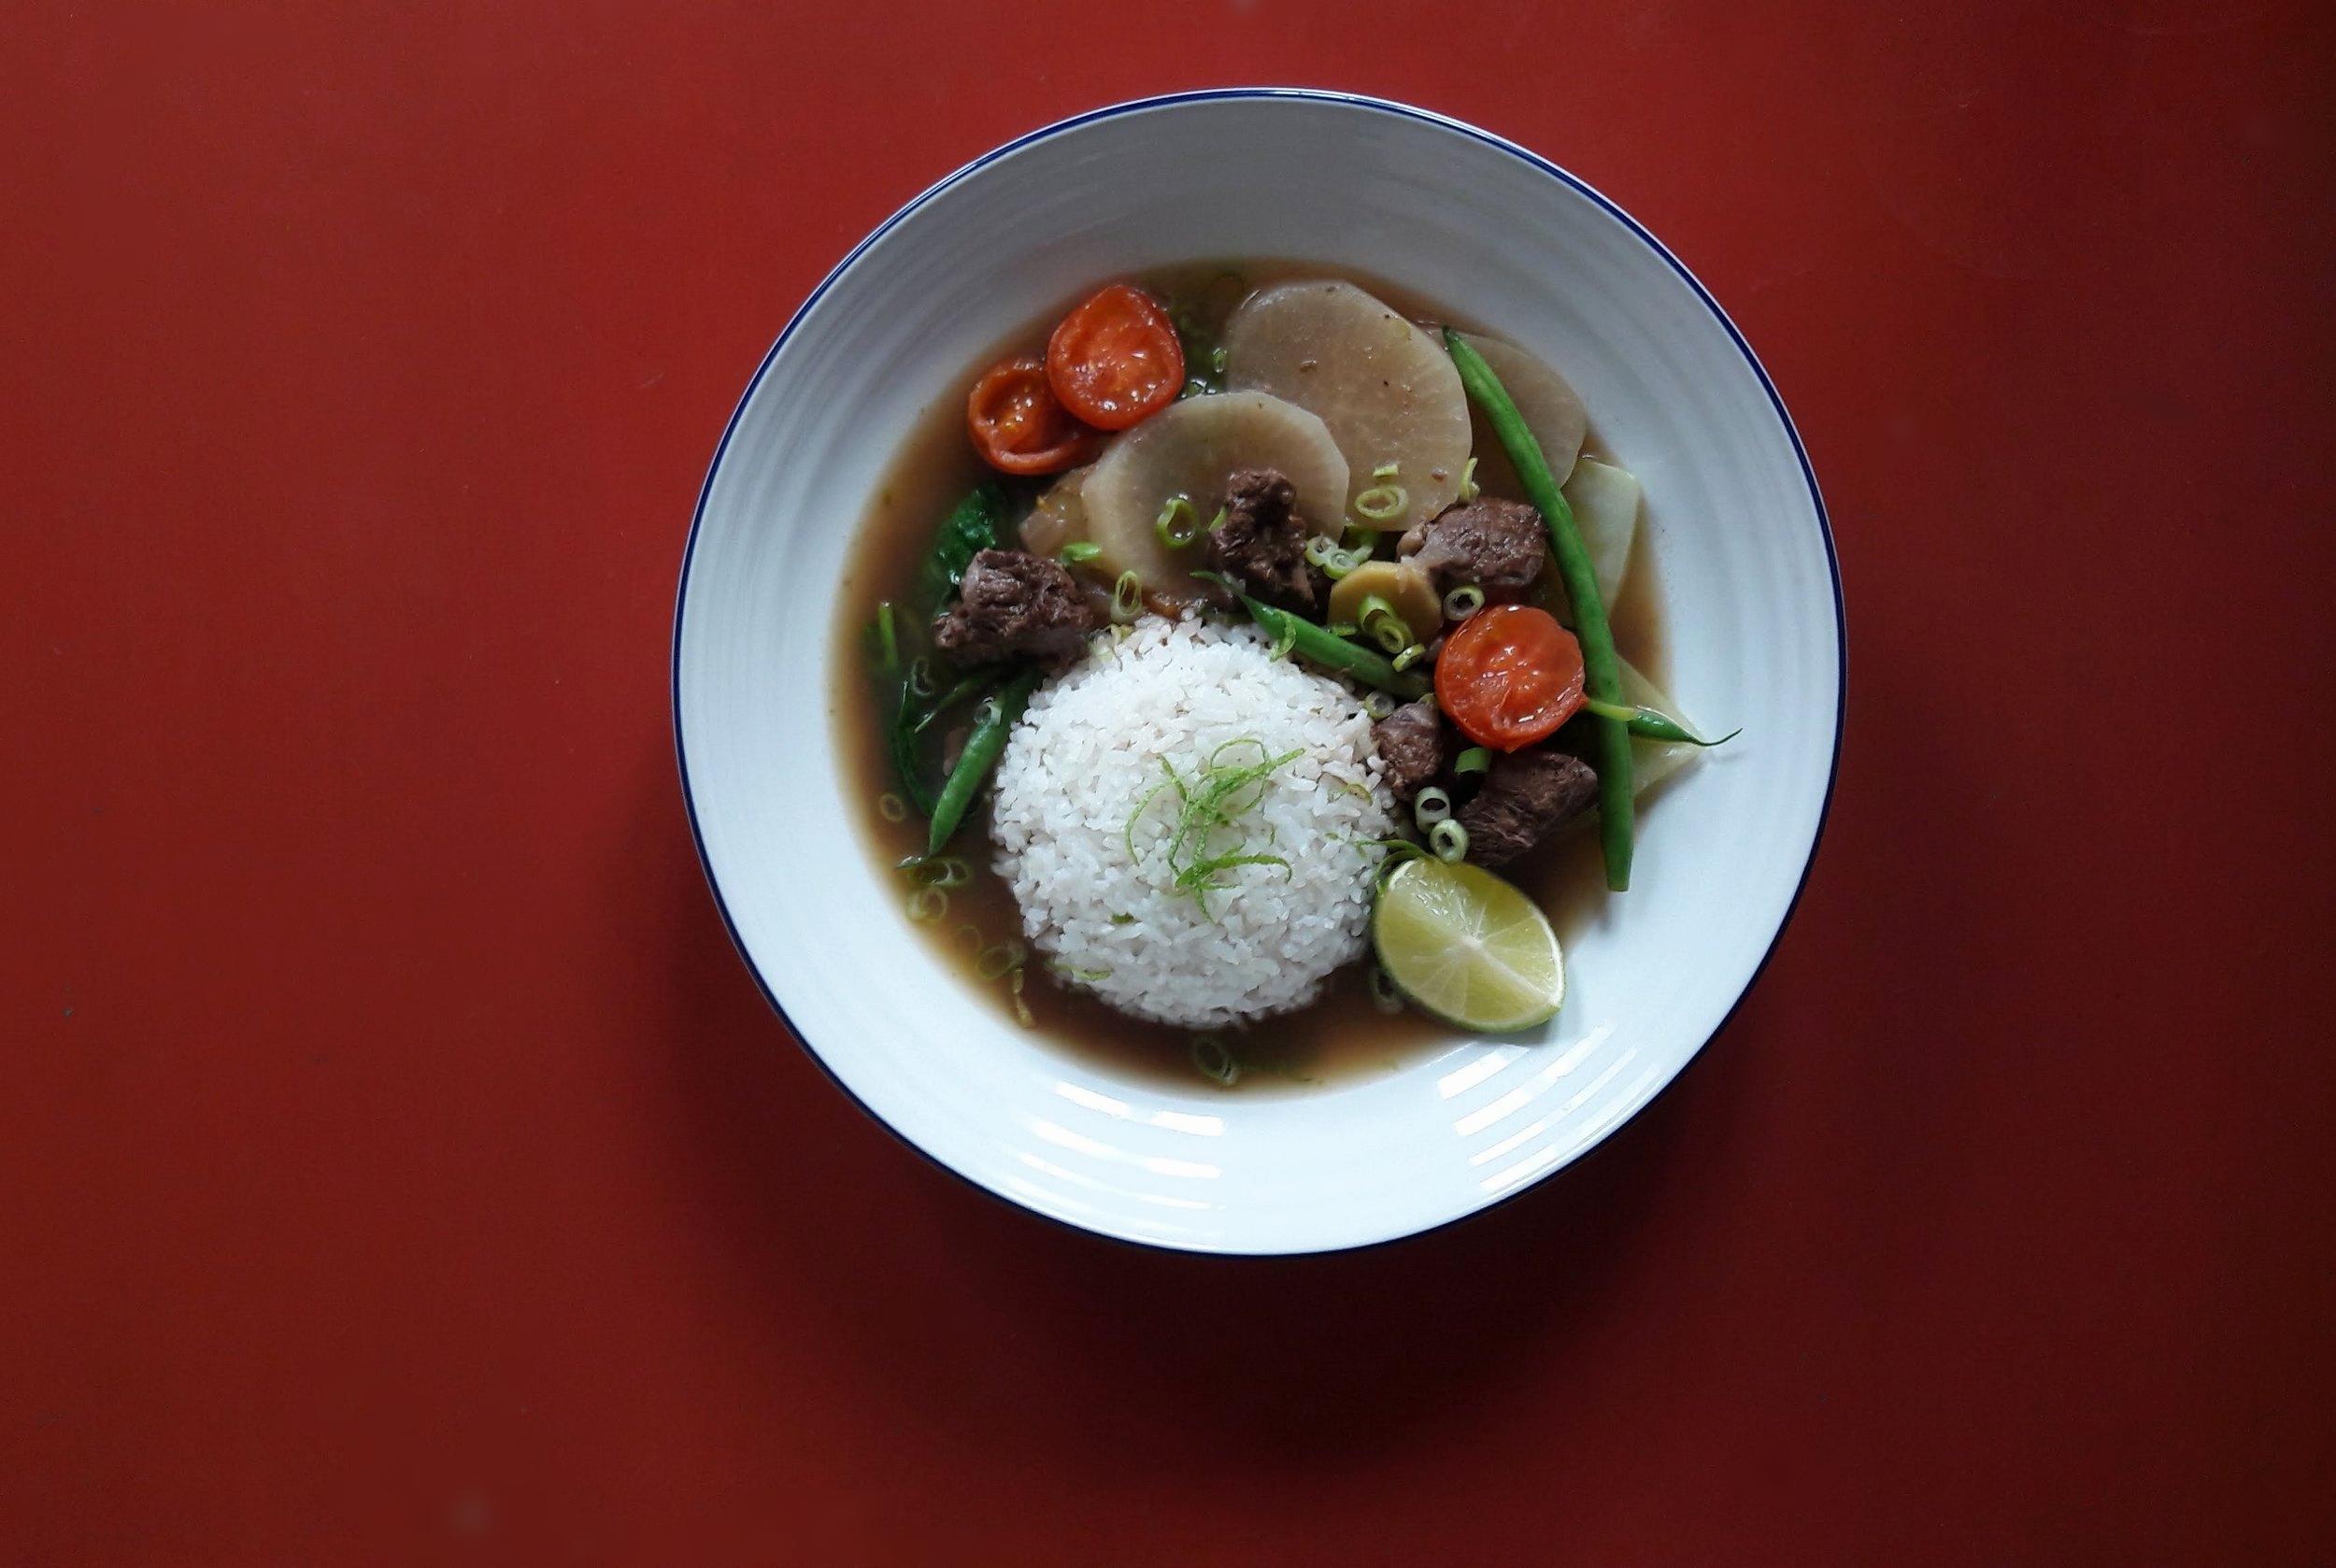 Sinigang Na Baka - A hot and sour tamarind broth with beef shortribs, daikon, ginger and pak choi